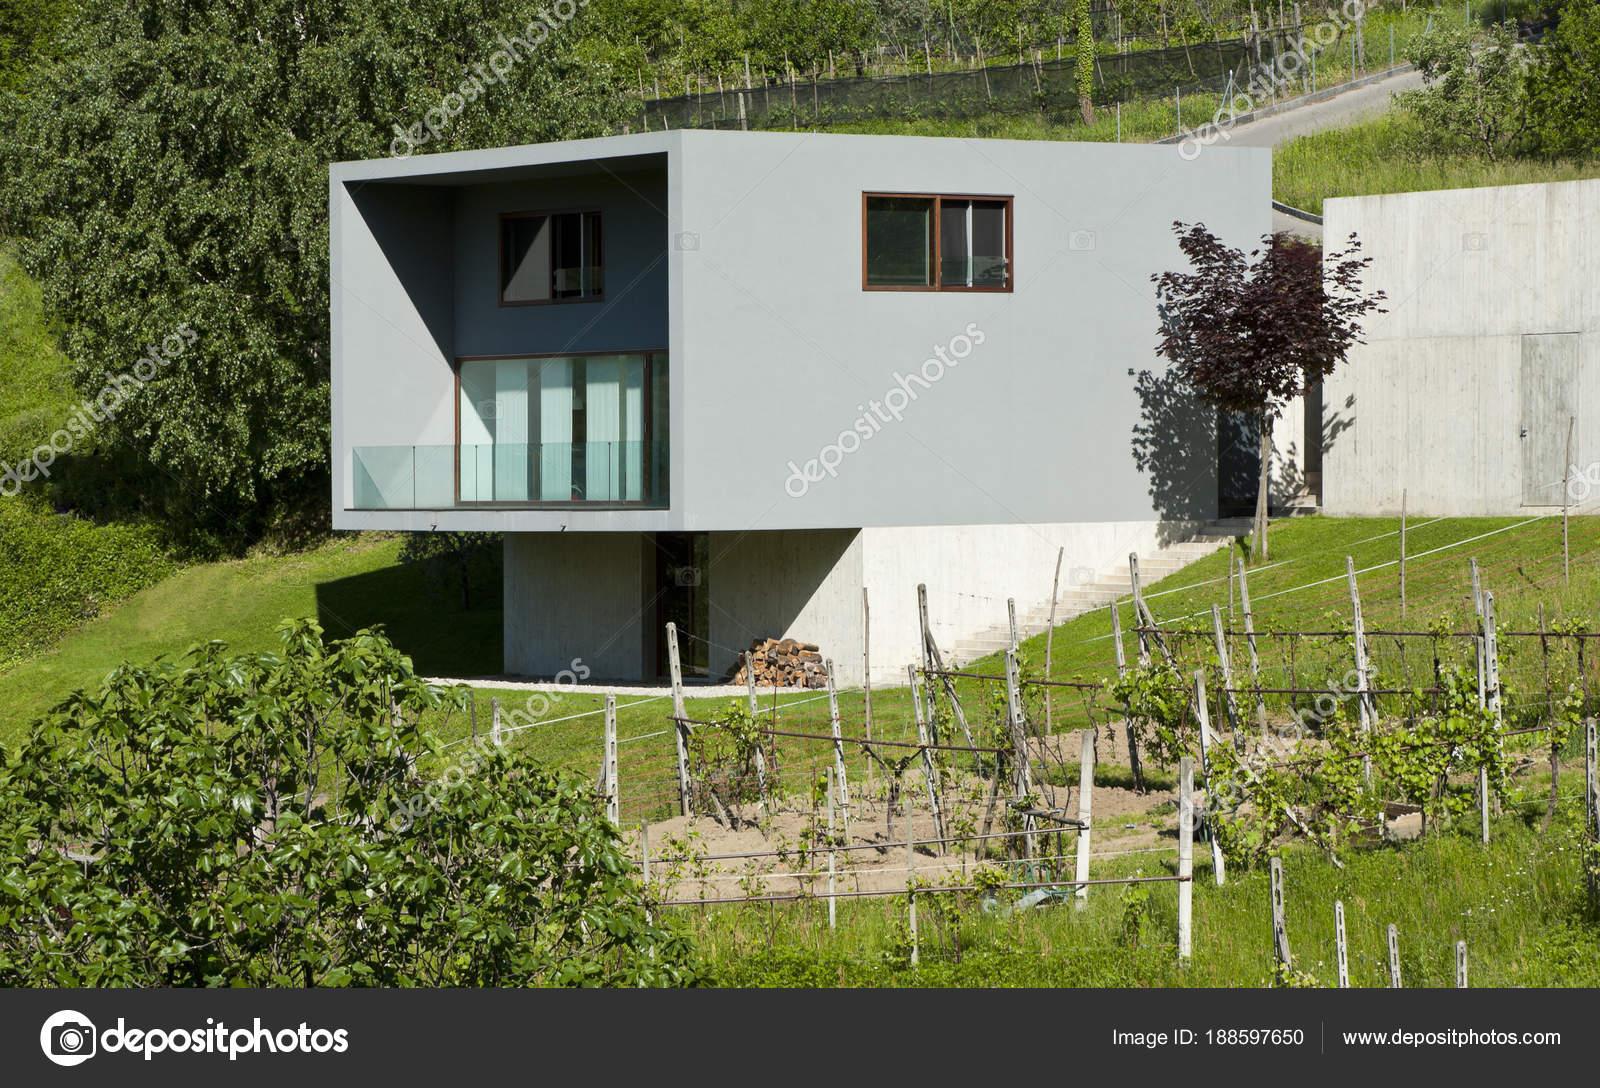 Villa in stile moderno esterno foto stock zveiger for Casa stile moderno